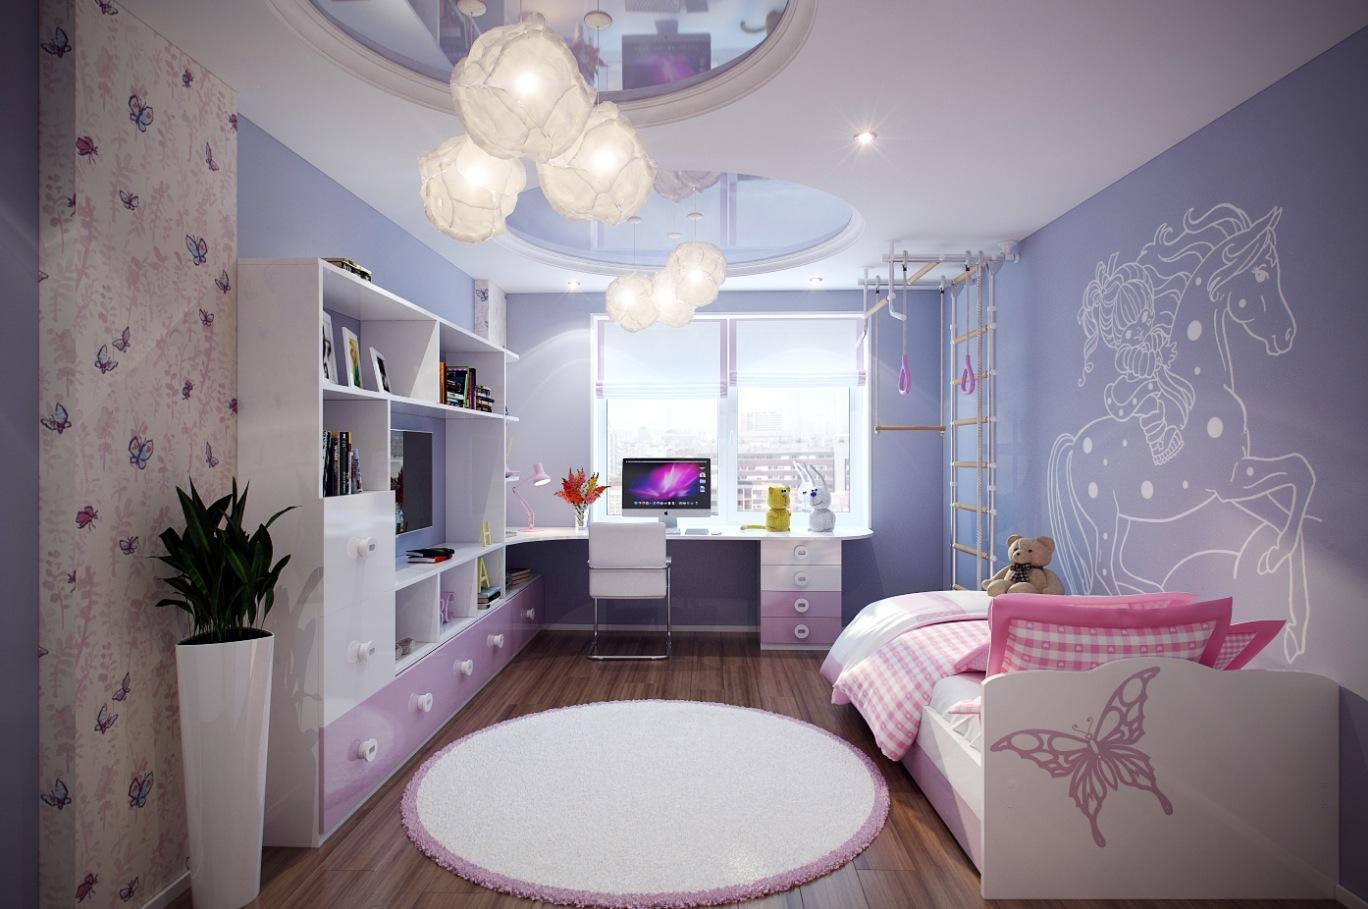 بالصور غرف بنات كبار , غرف نوم عصريه لبنات كبار